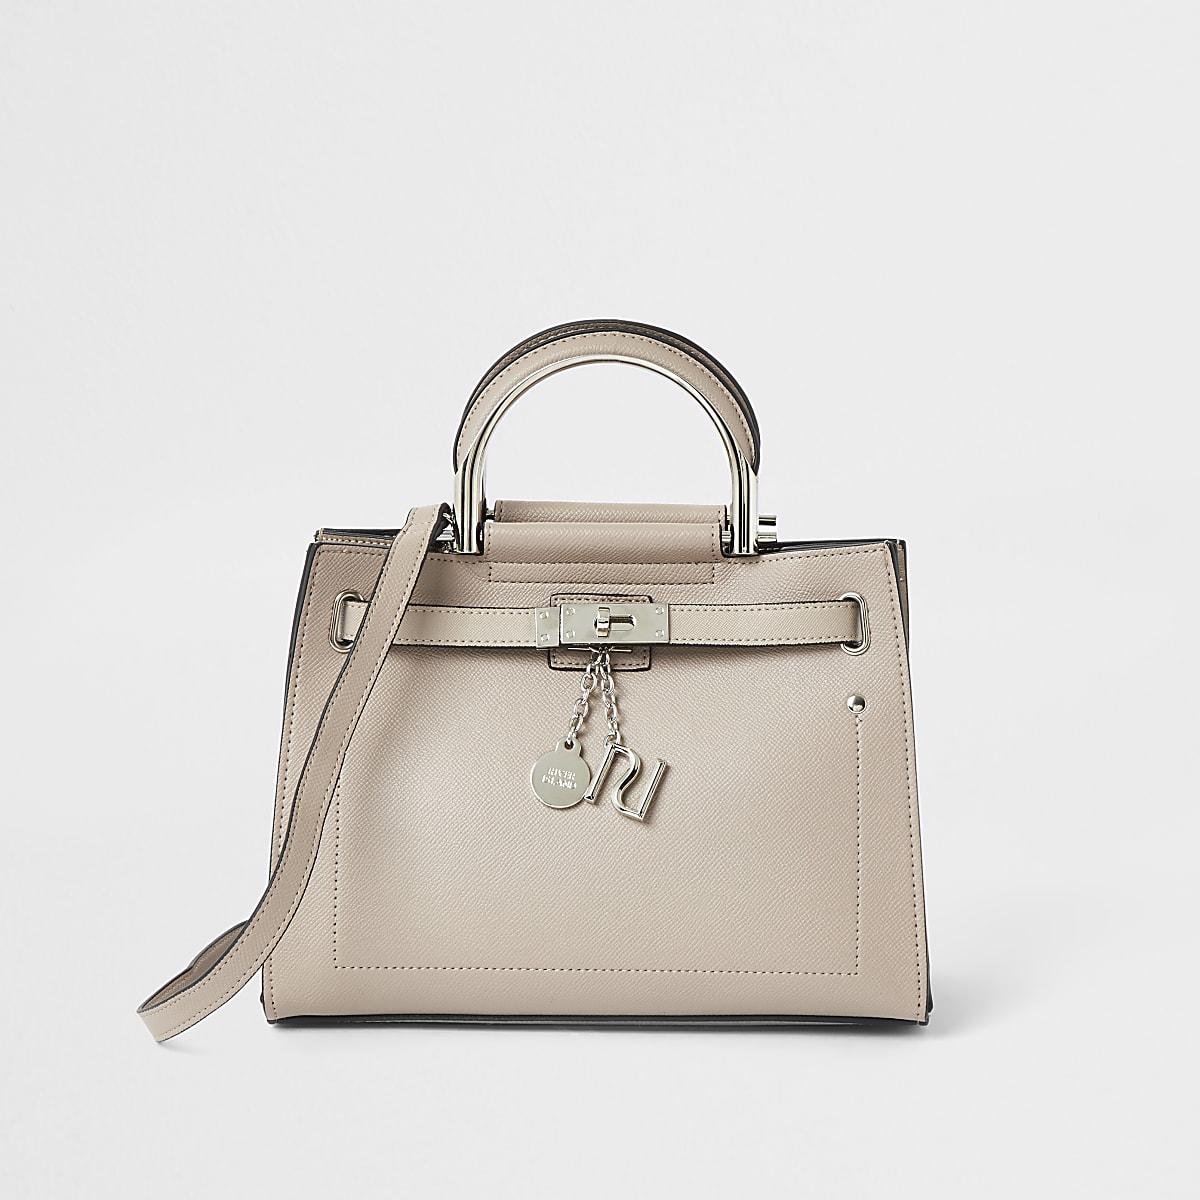 Light beige mini tote bag